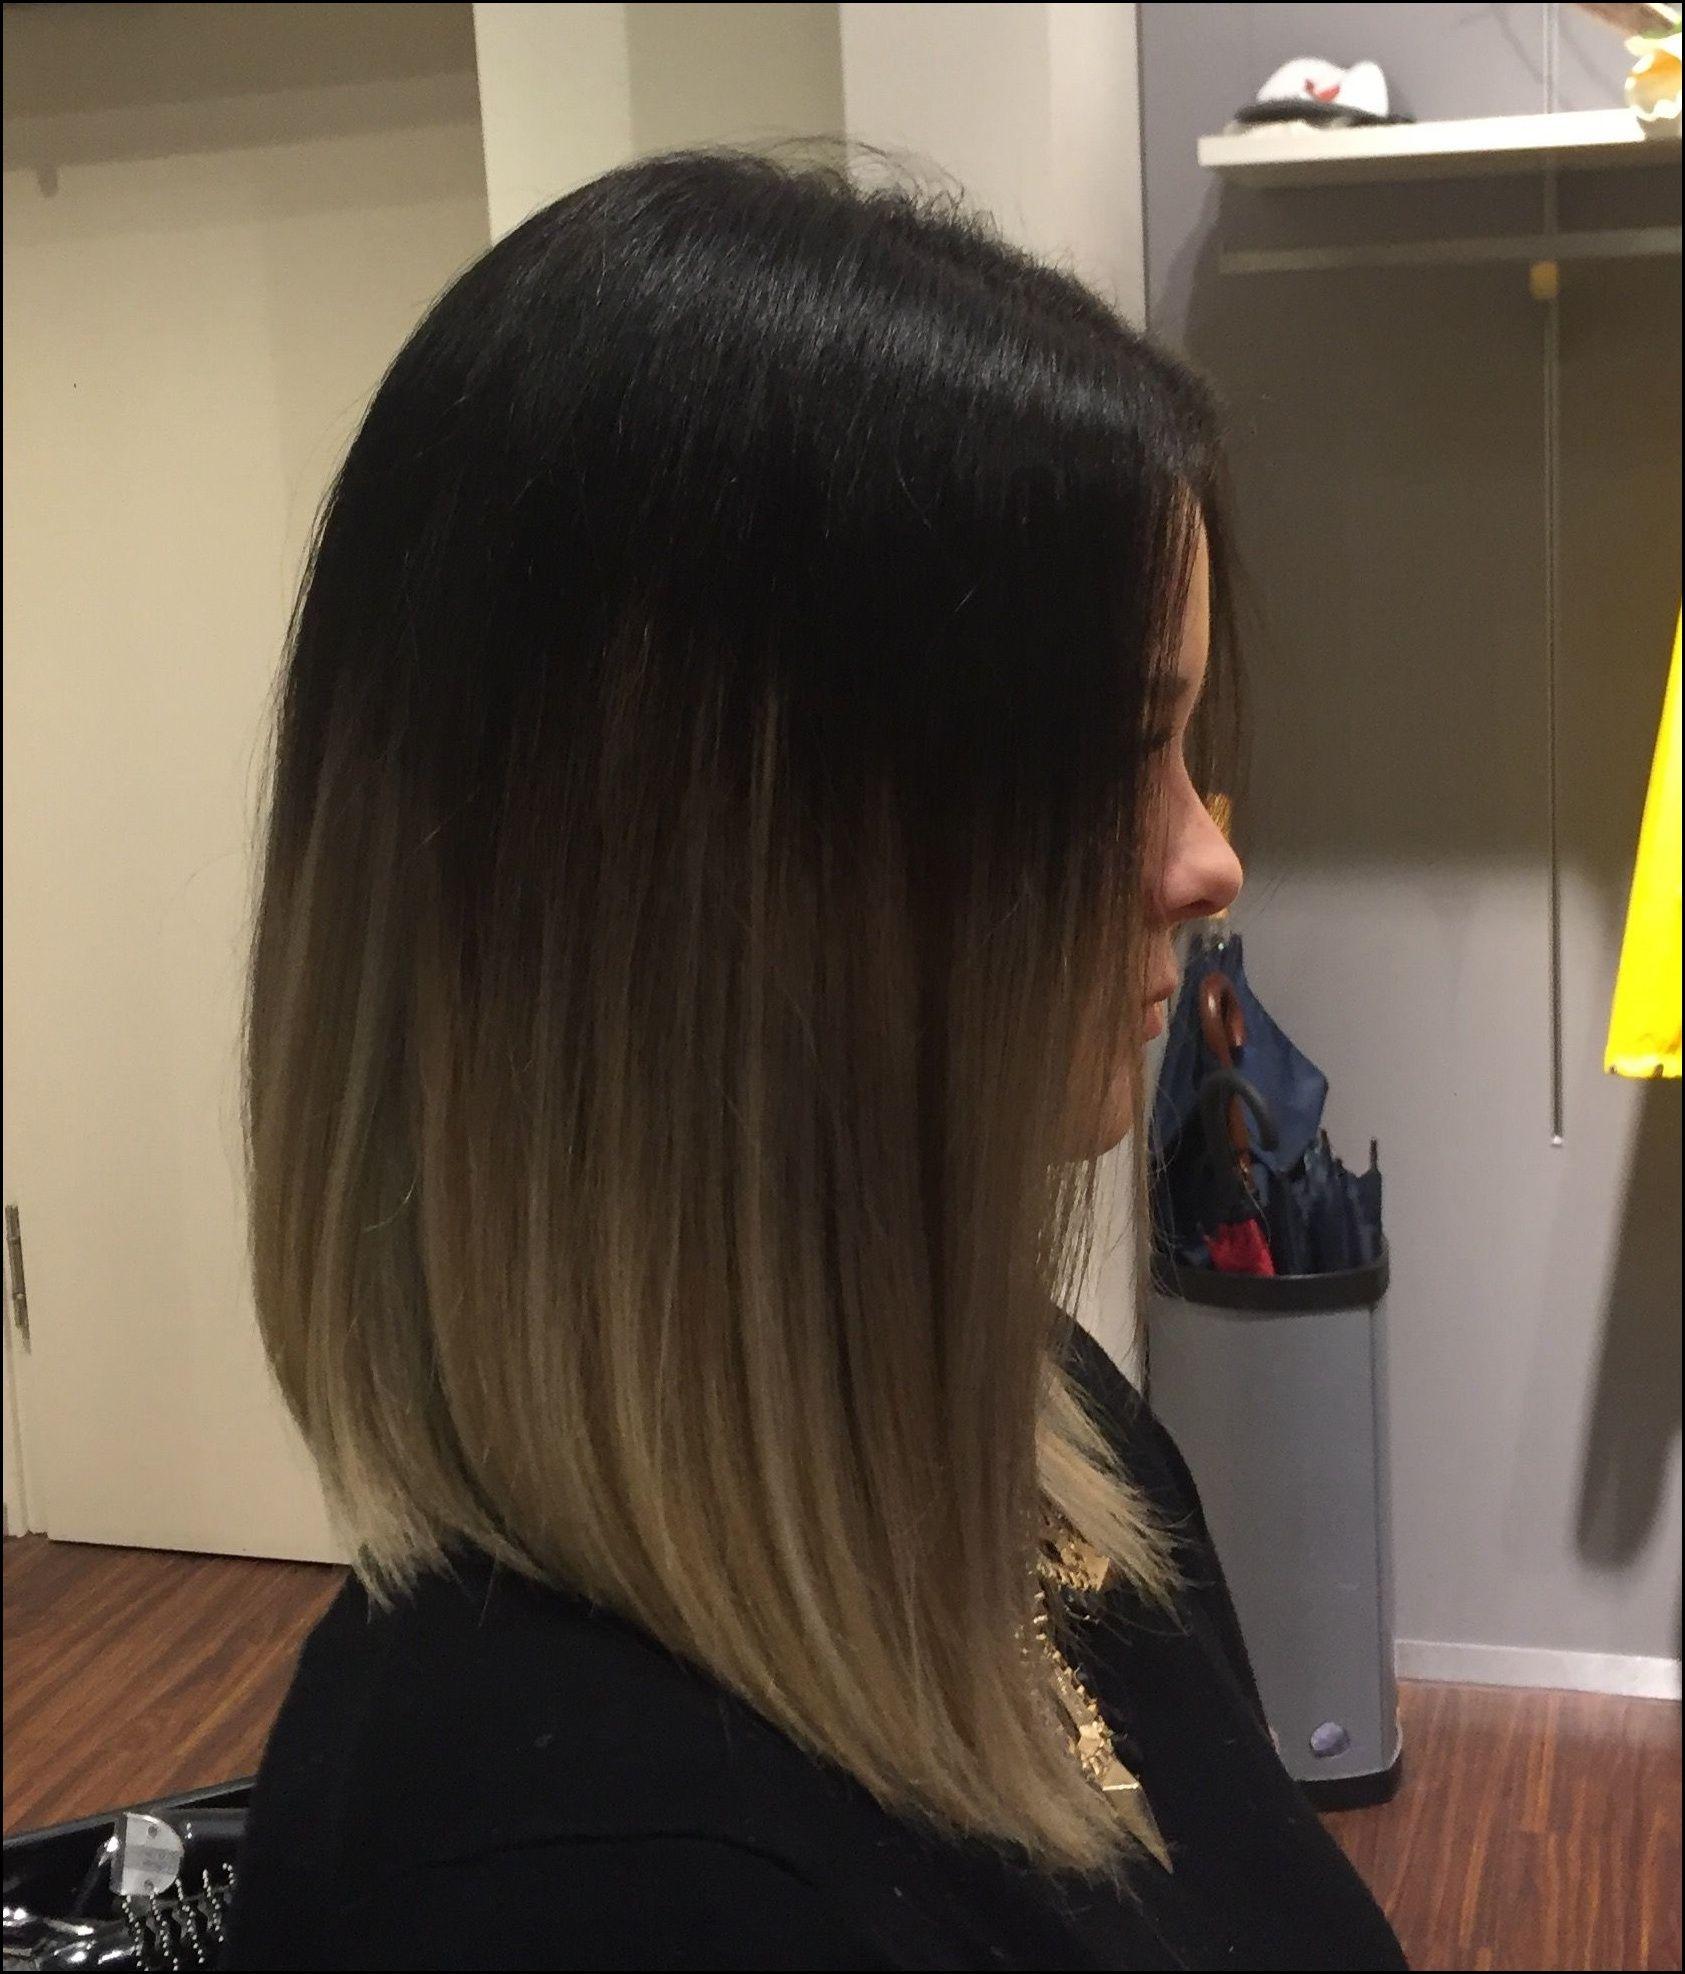 Longbob Grey Grau Schwarz Black Brown Braun Blonde Blond Balayage Frisuren Balayage Bob Frisur